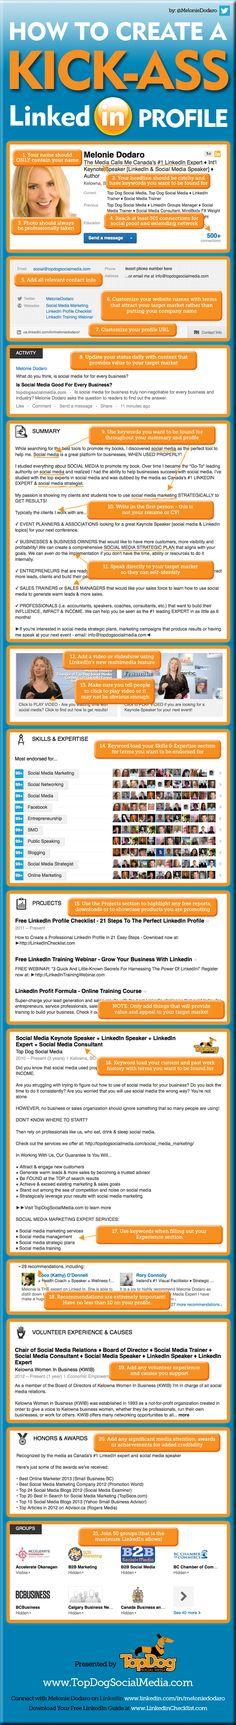 Cómo crear un gran perfil de Linkedin #infografia #infographic #socialmedia